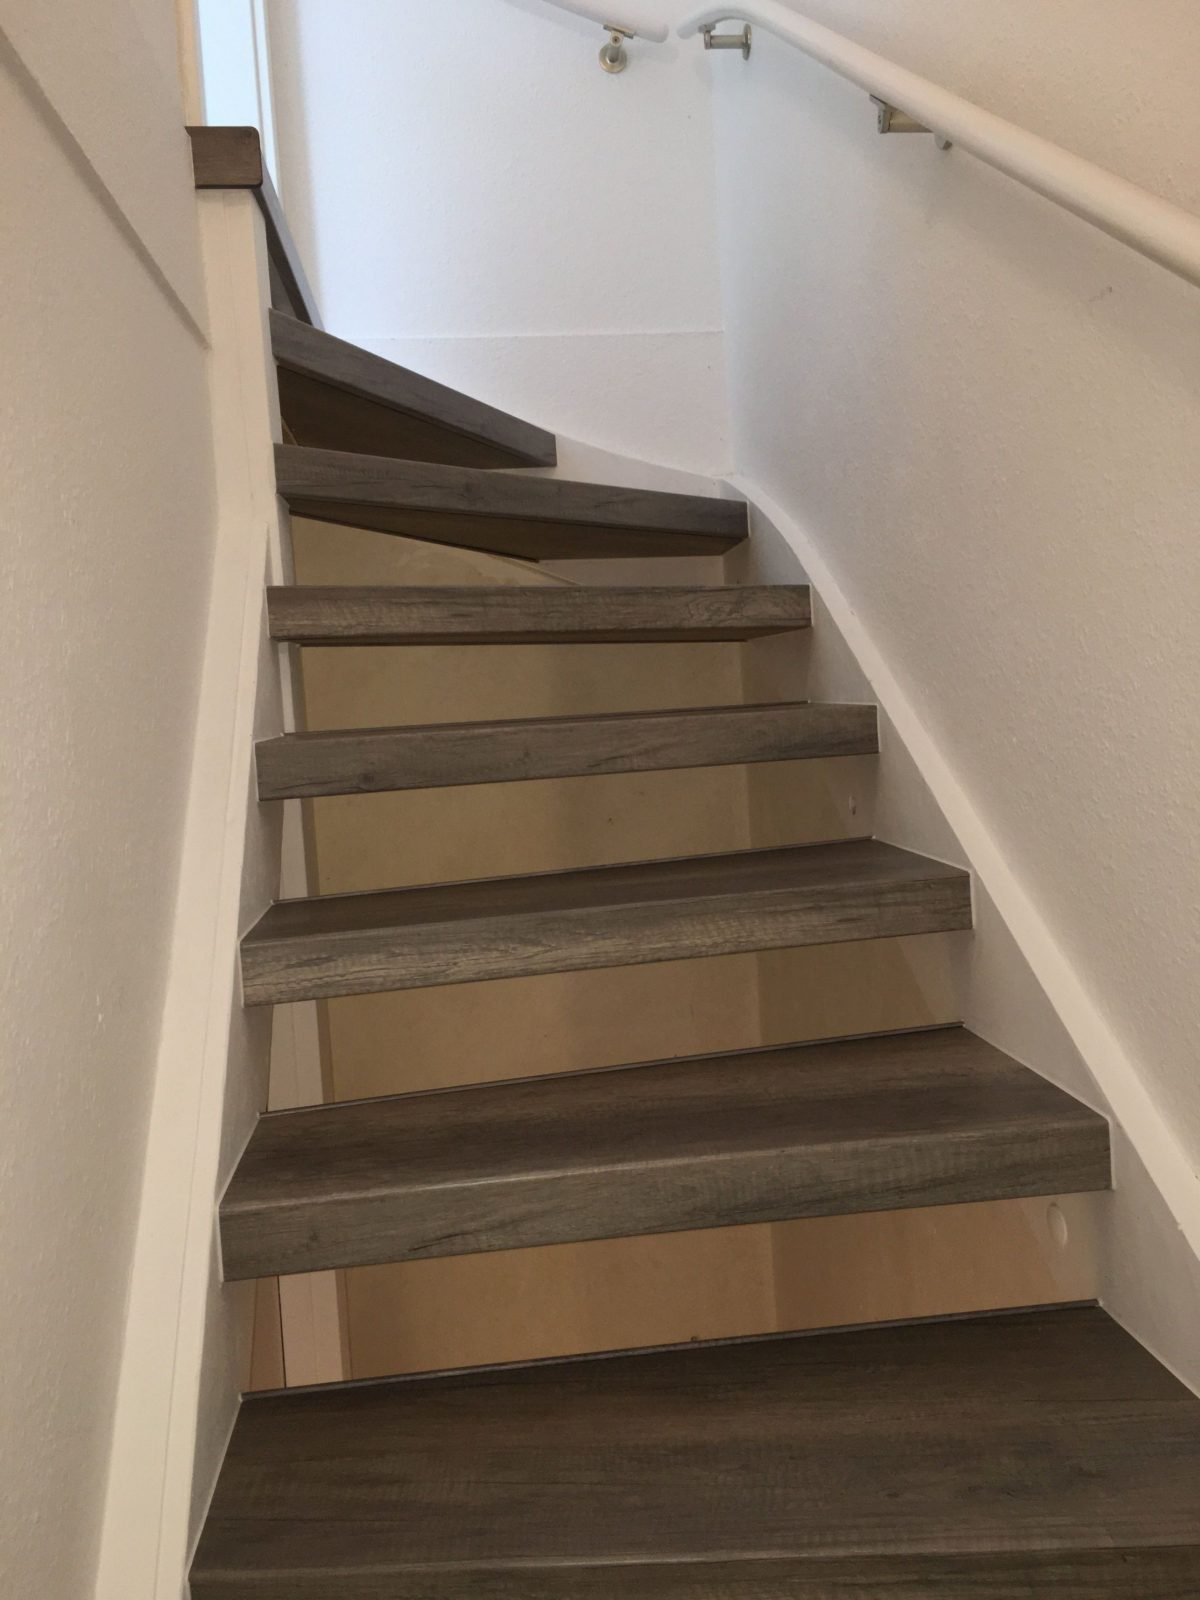 Alte Treppe Idee Fene Treppen Neu Gestalten Alte Treppe Neu von Alte Holztreppe Neu Gestalten Bild